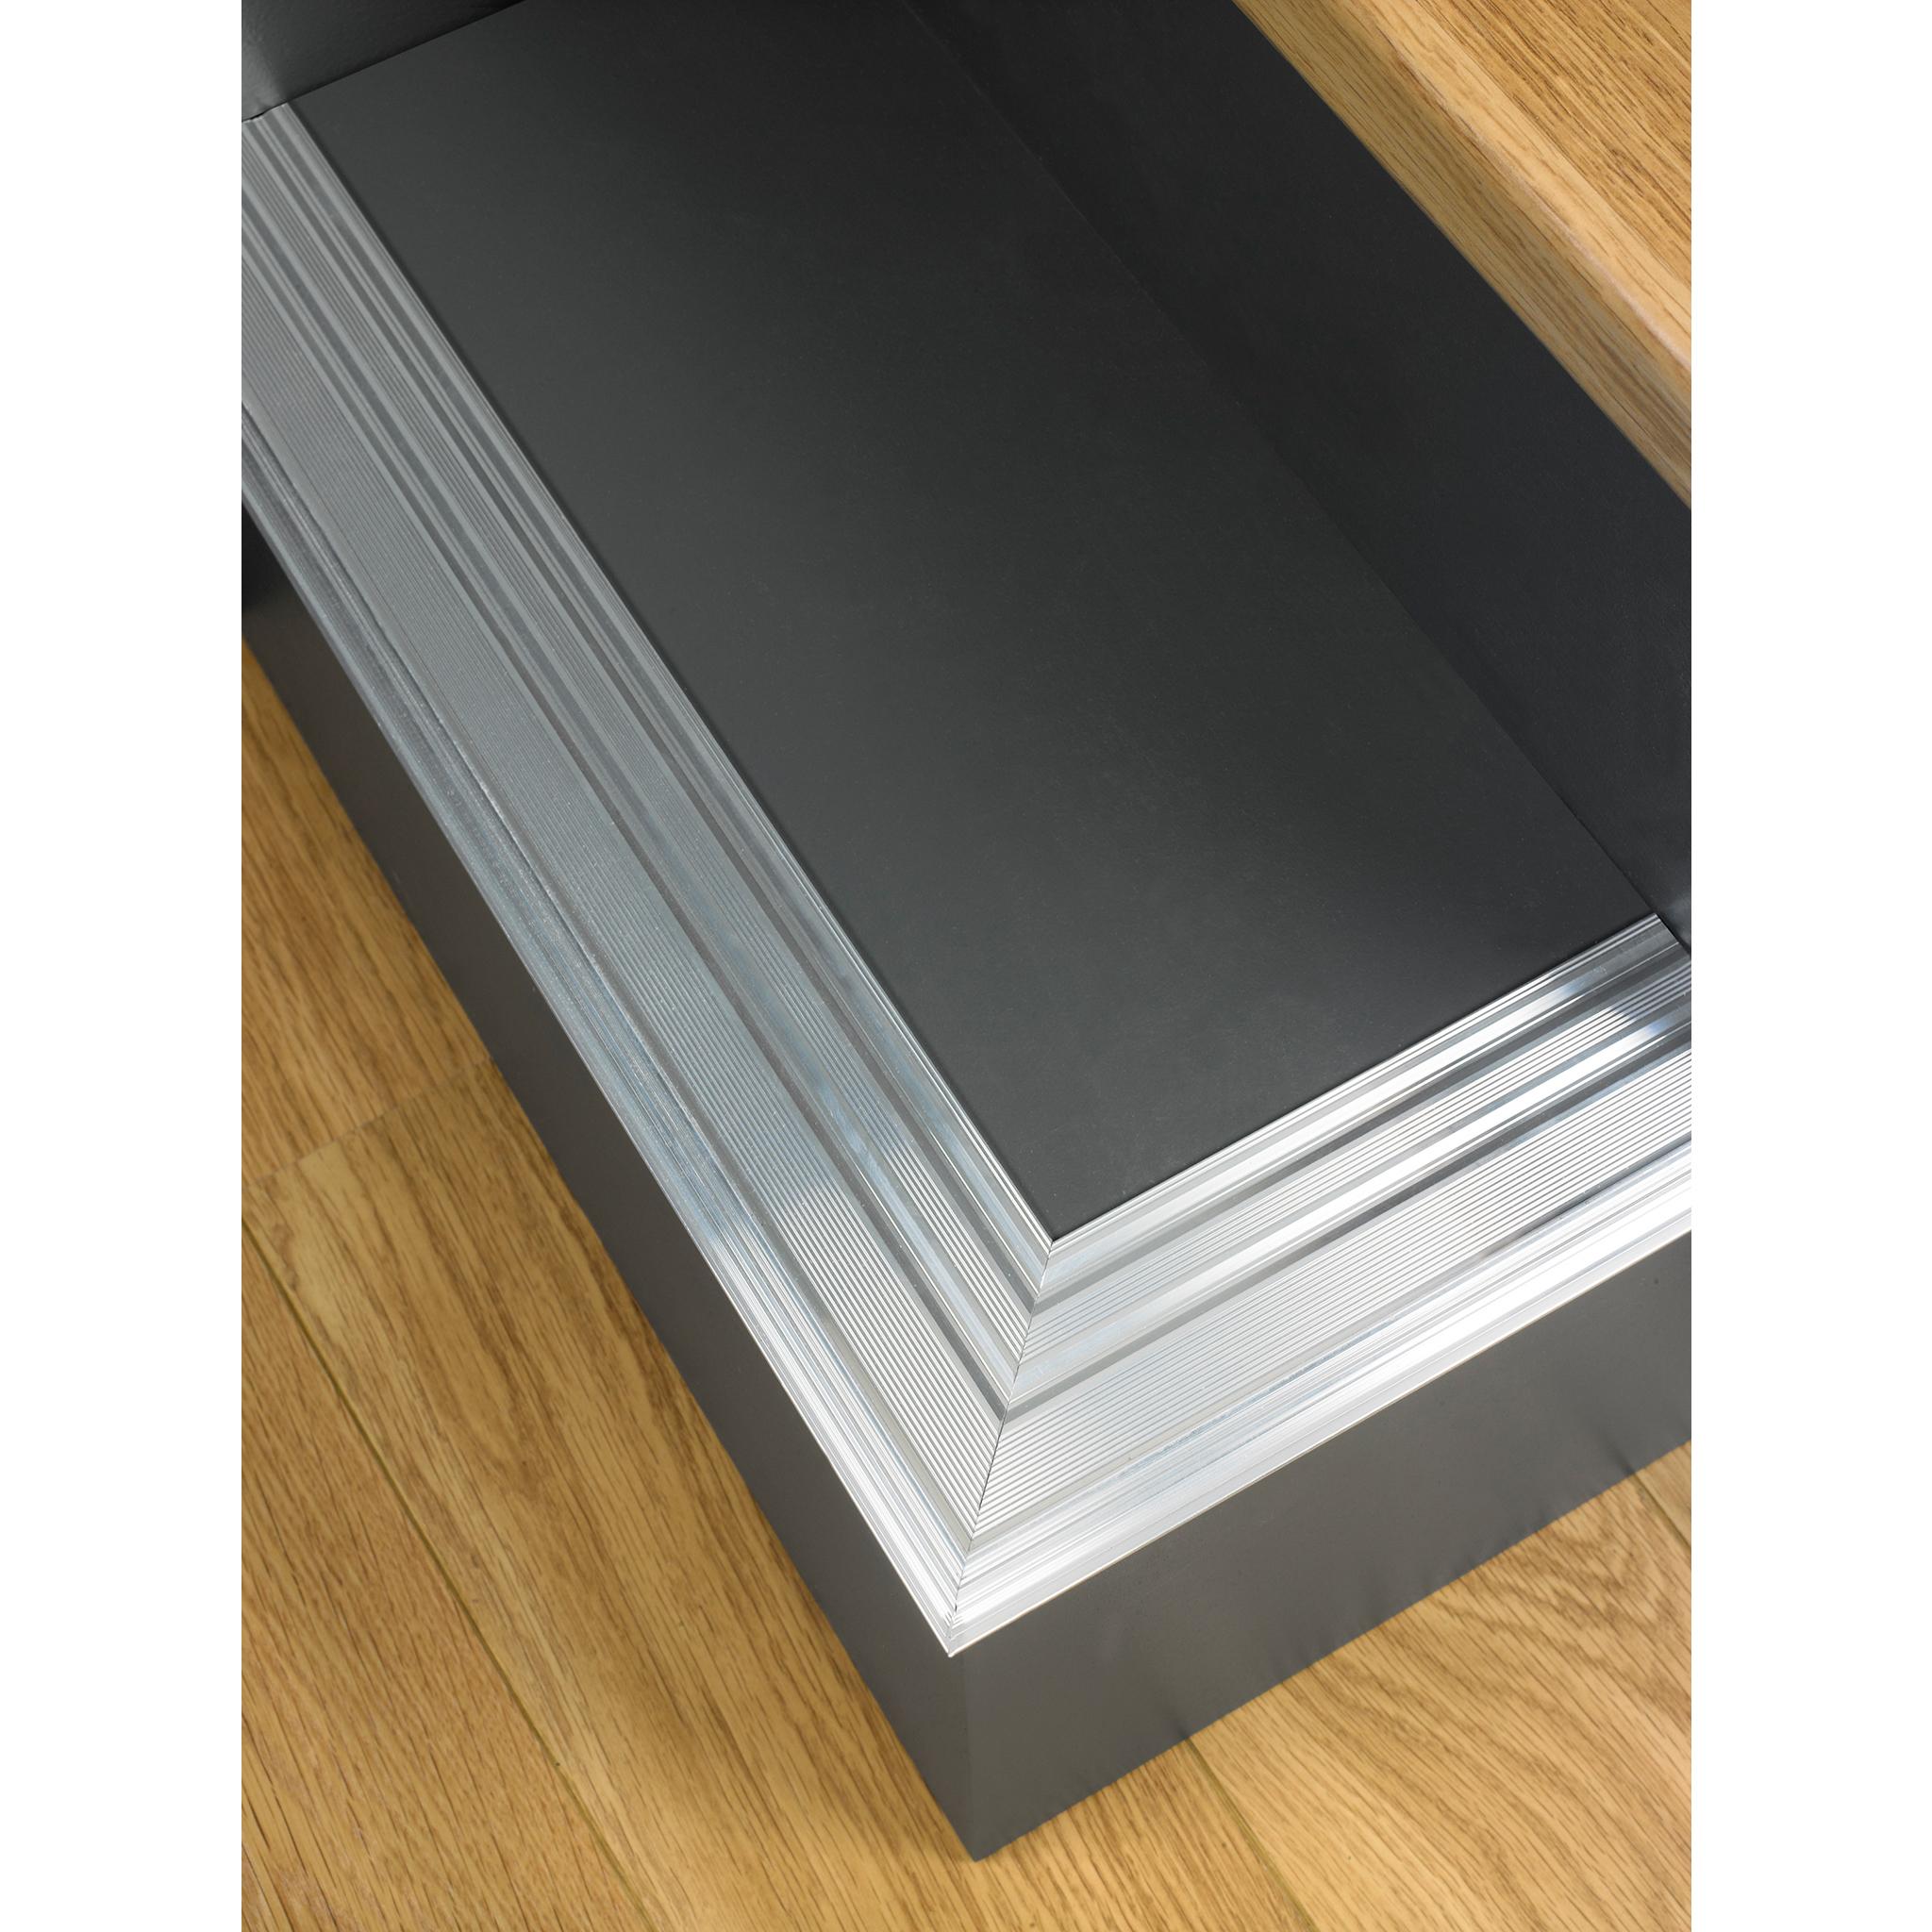 Engineered Oak Flooring Magnet: Incizo Aluminium Stair Base For 7mm Flooring